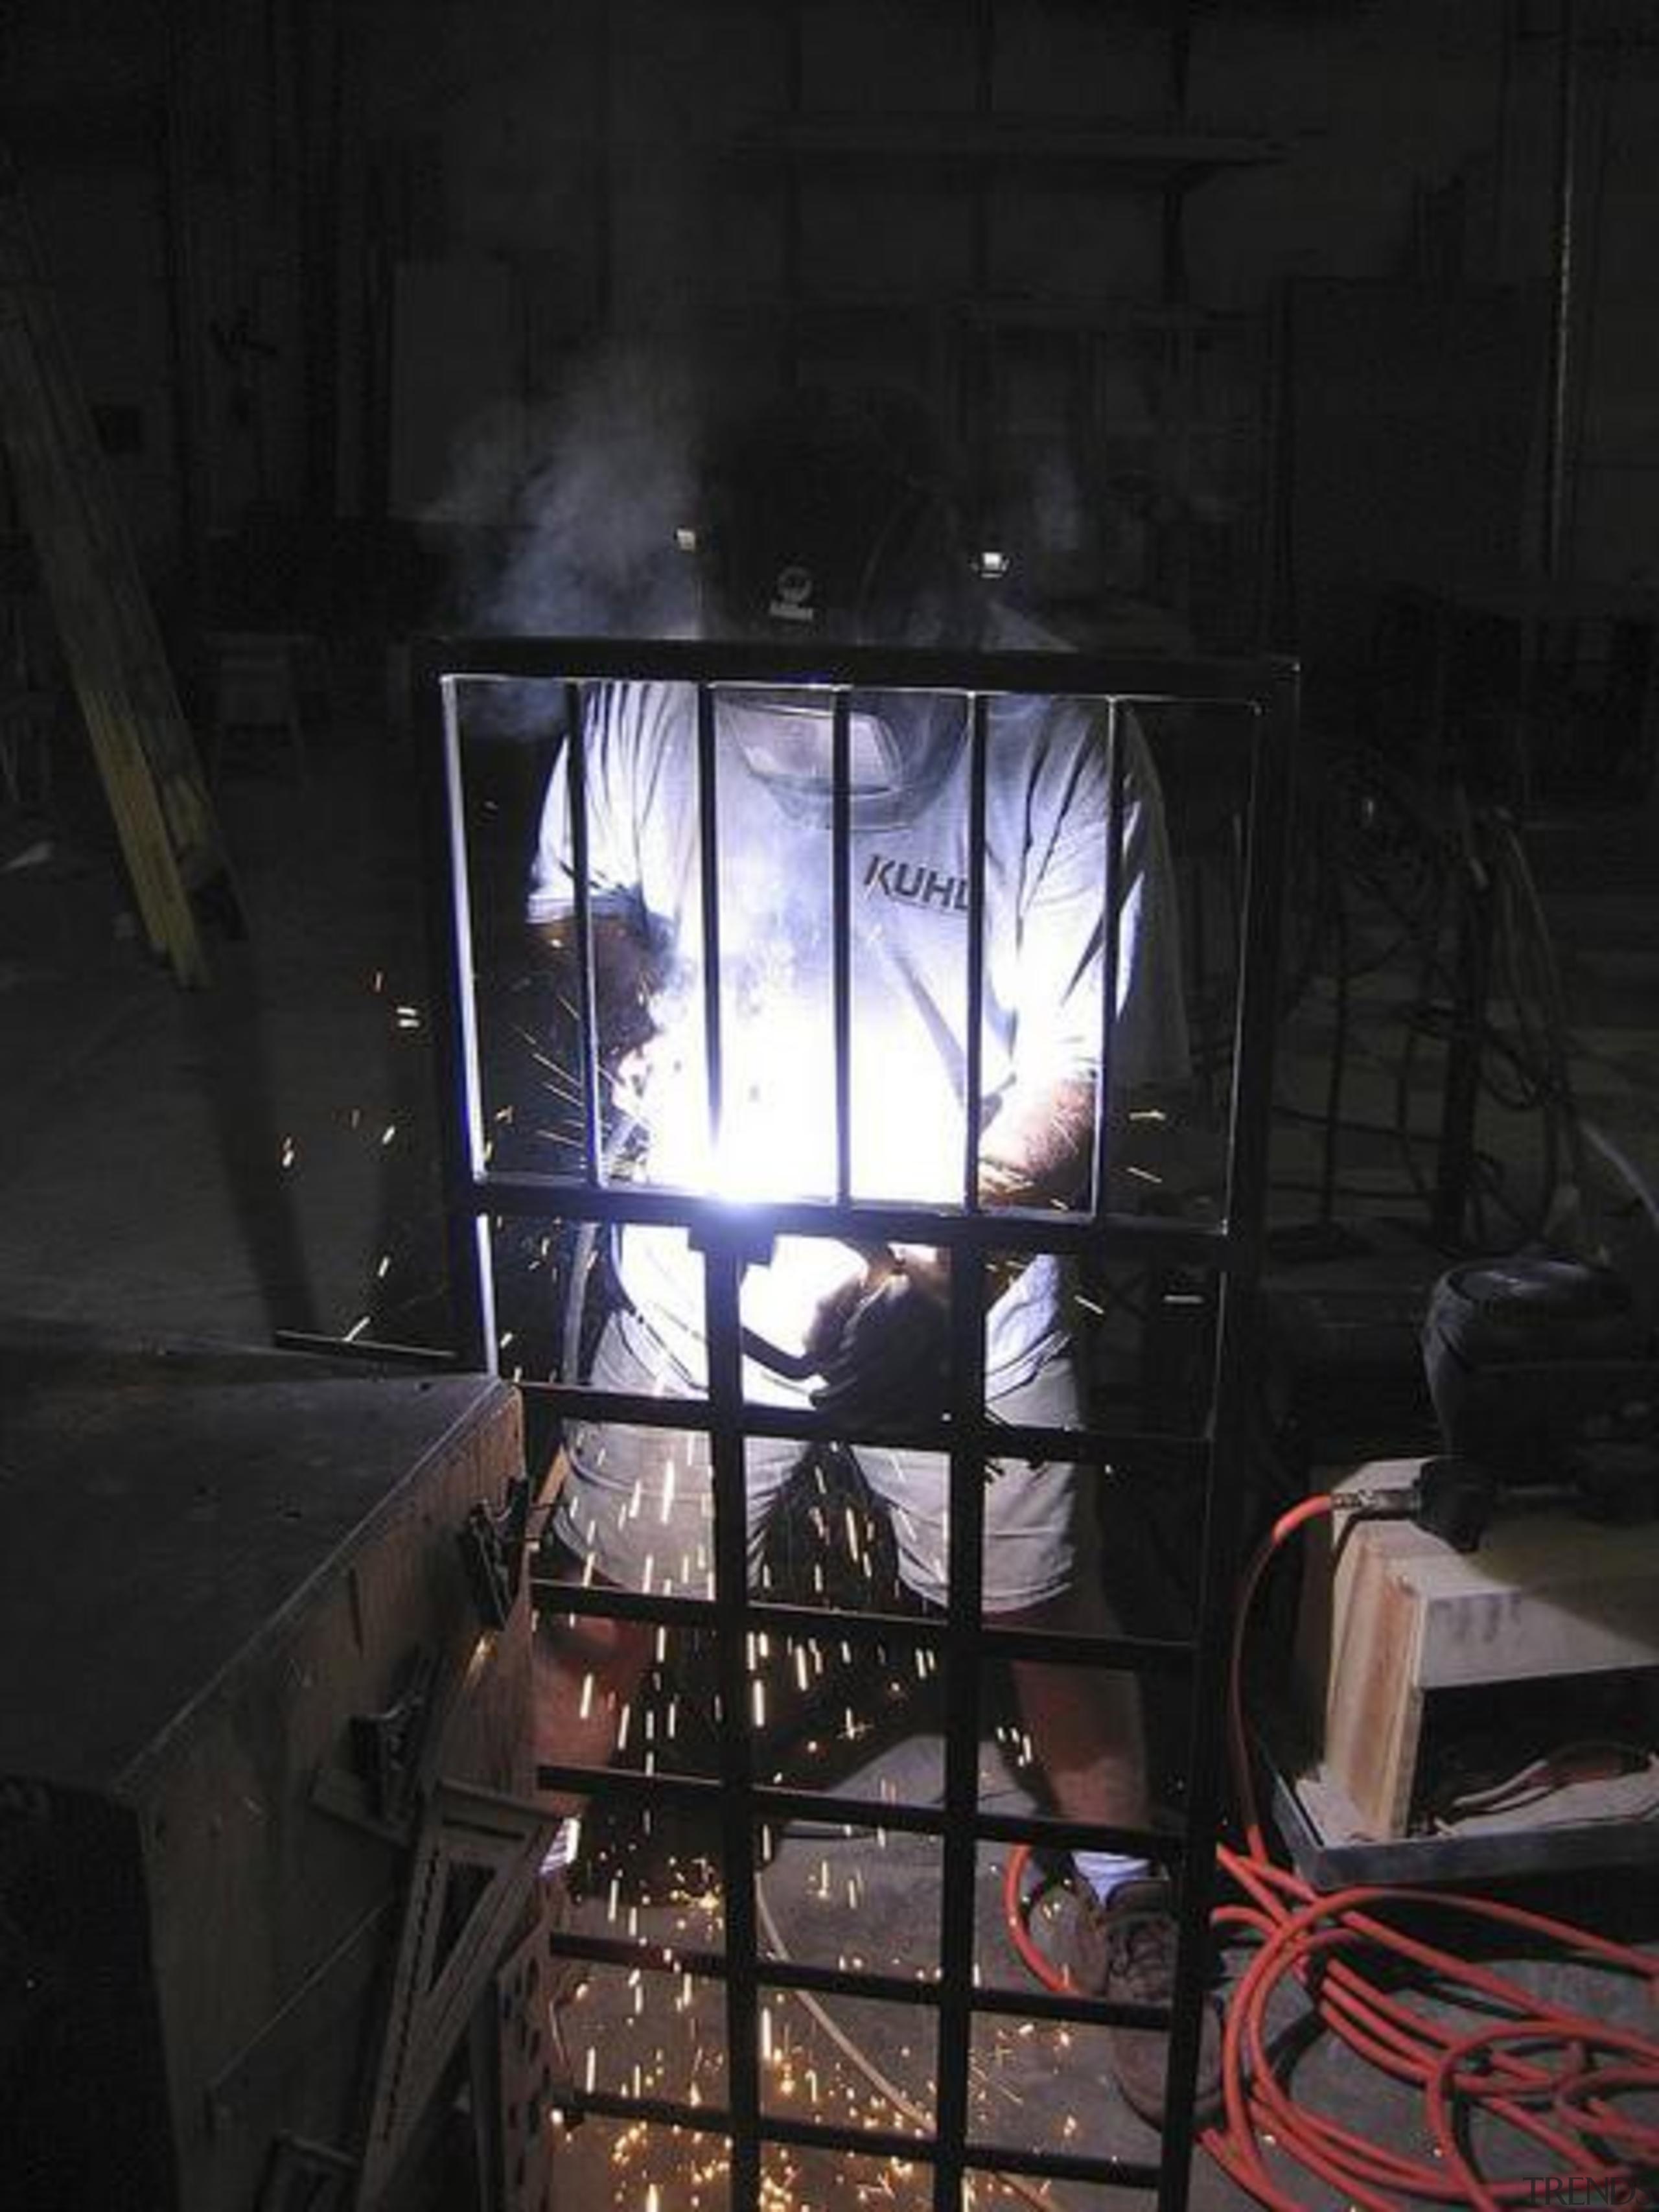 Created by Steve Kuhl of Kuhl Design Build, darkness, glass, light, metal, black